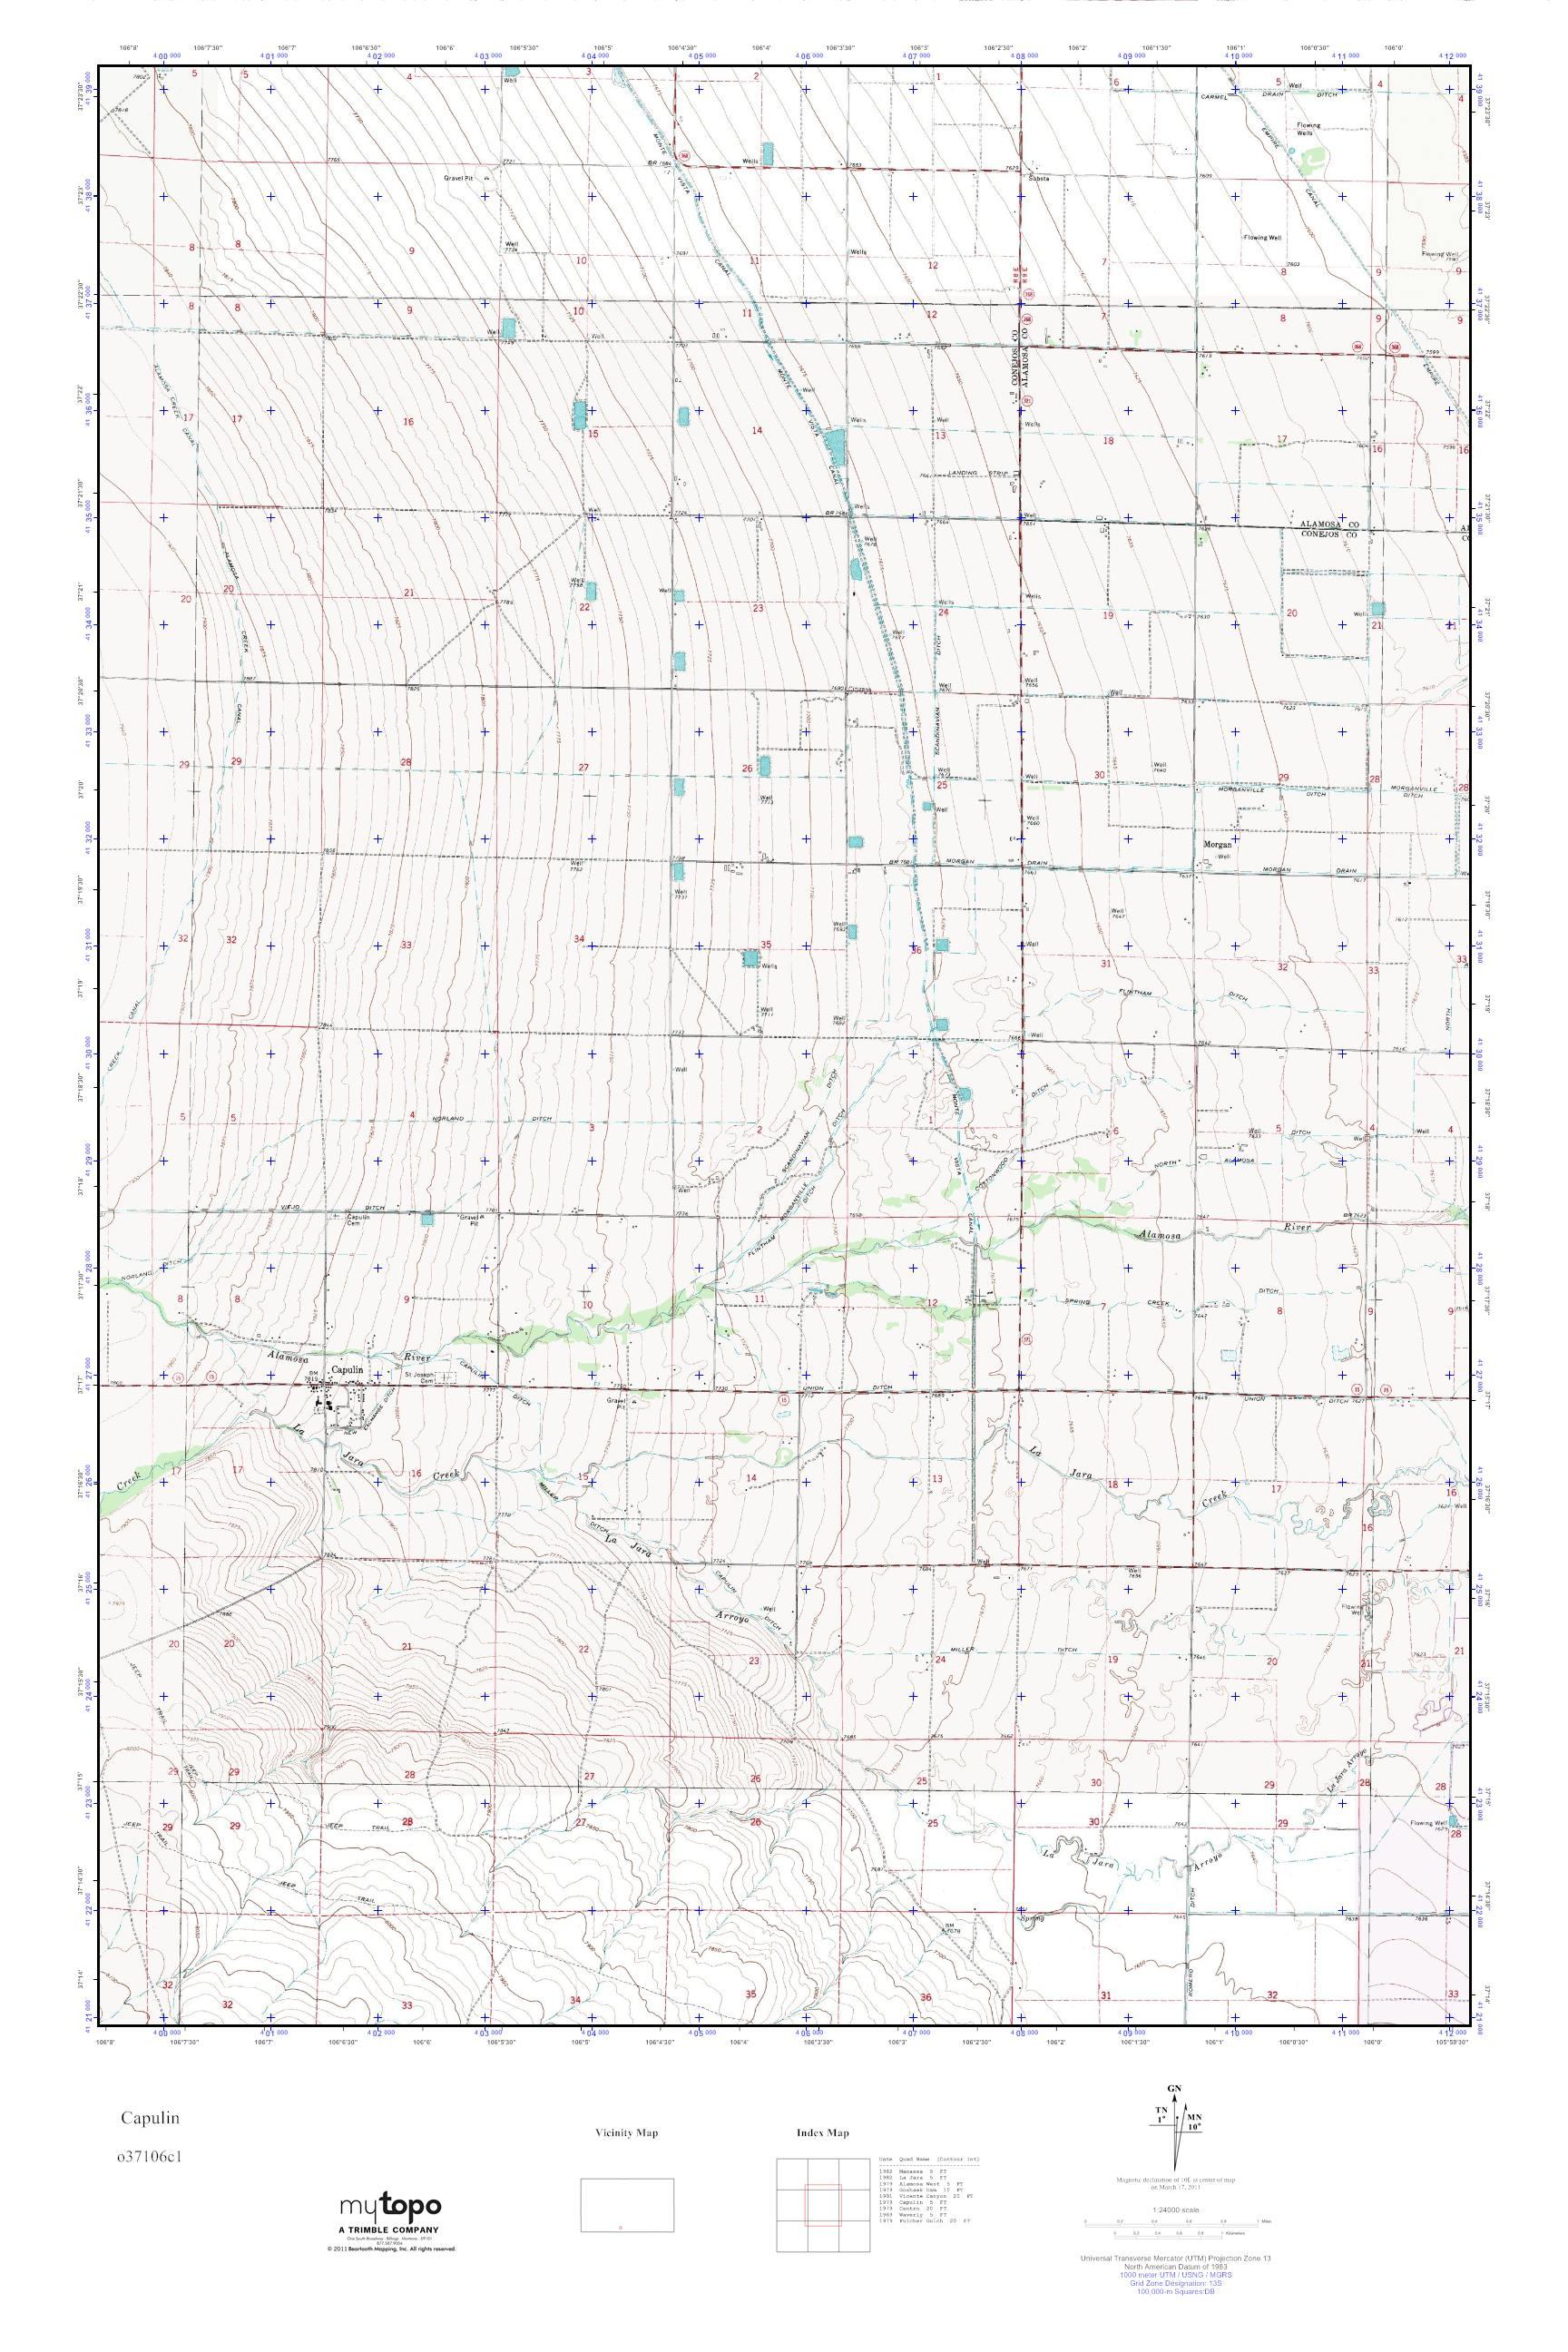 MyTopo Capulin, Colorado USGS Quad Topo Map